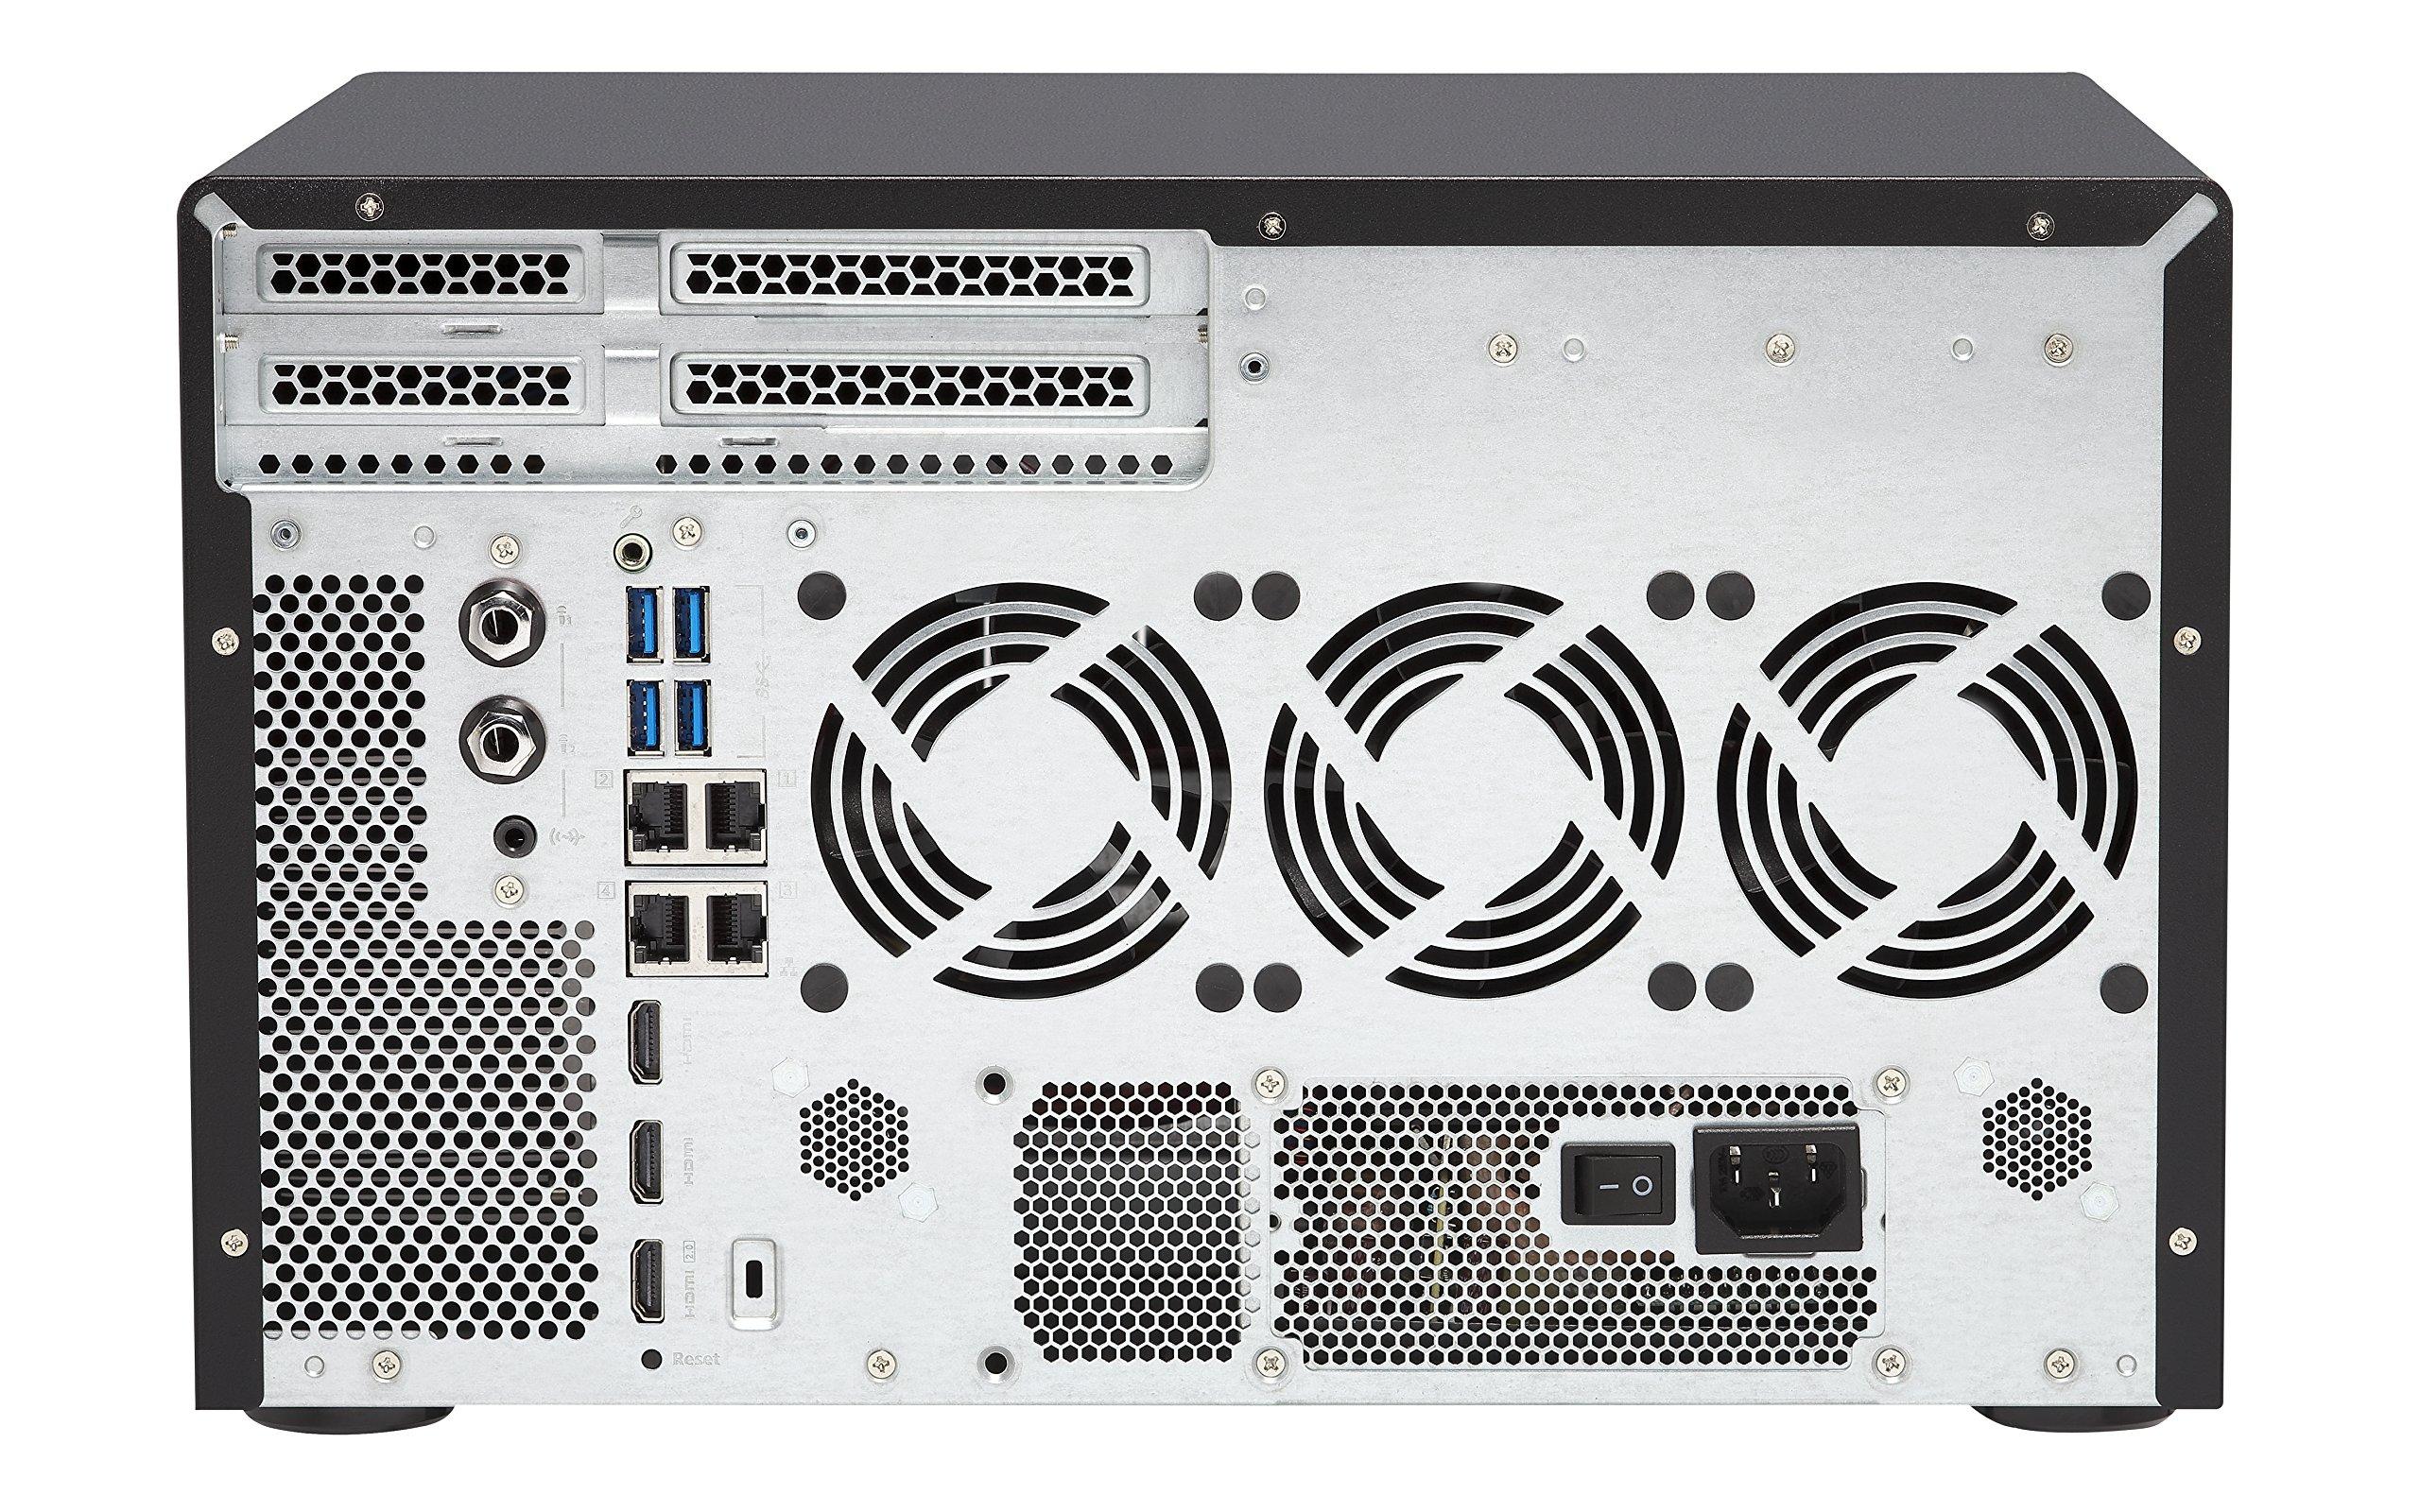 Qnap TVS-1282-i7-64G-US High Performance 12 bay (8+4) NAS/iSCSI IP-SAN, Intel Skylake Core i7-6700 3.4 GHz Quad Core, 32GB RAM, 10G-ready by QNAP (Image #1)